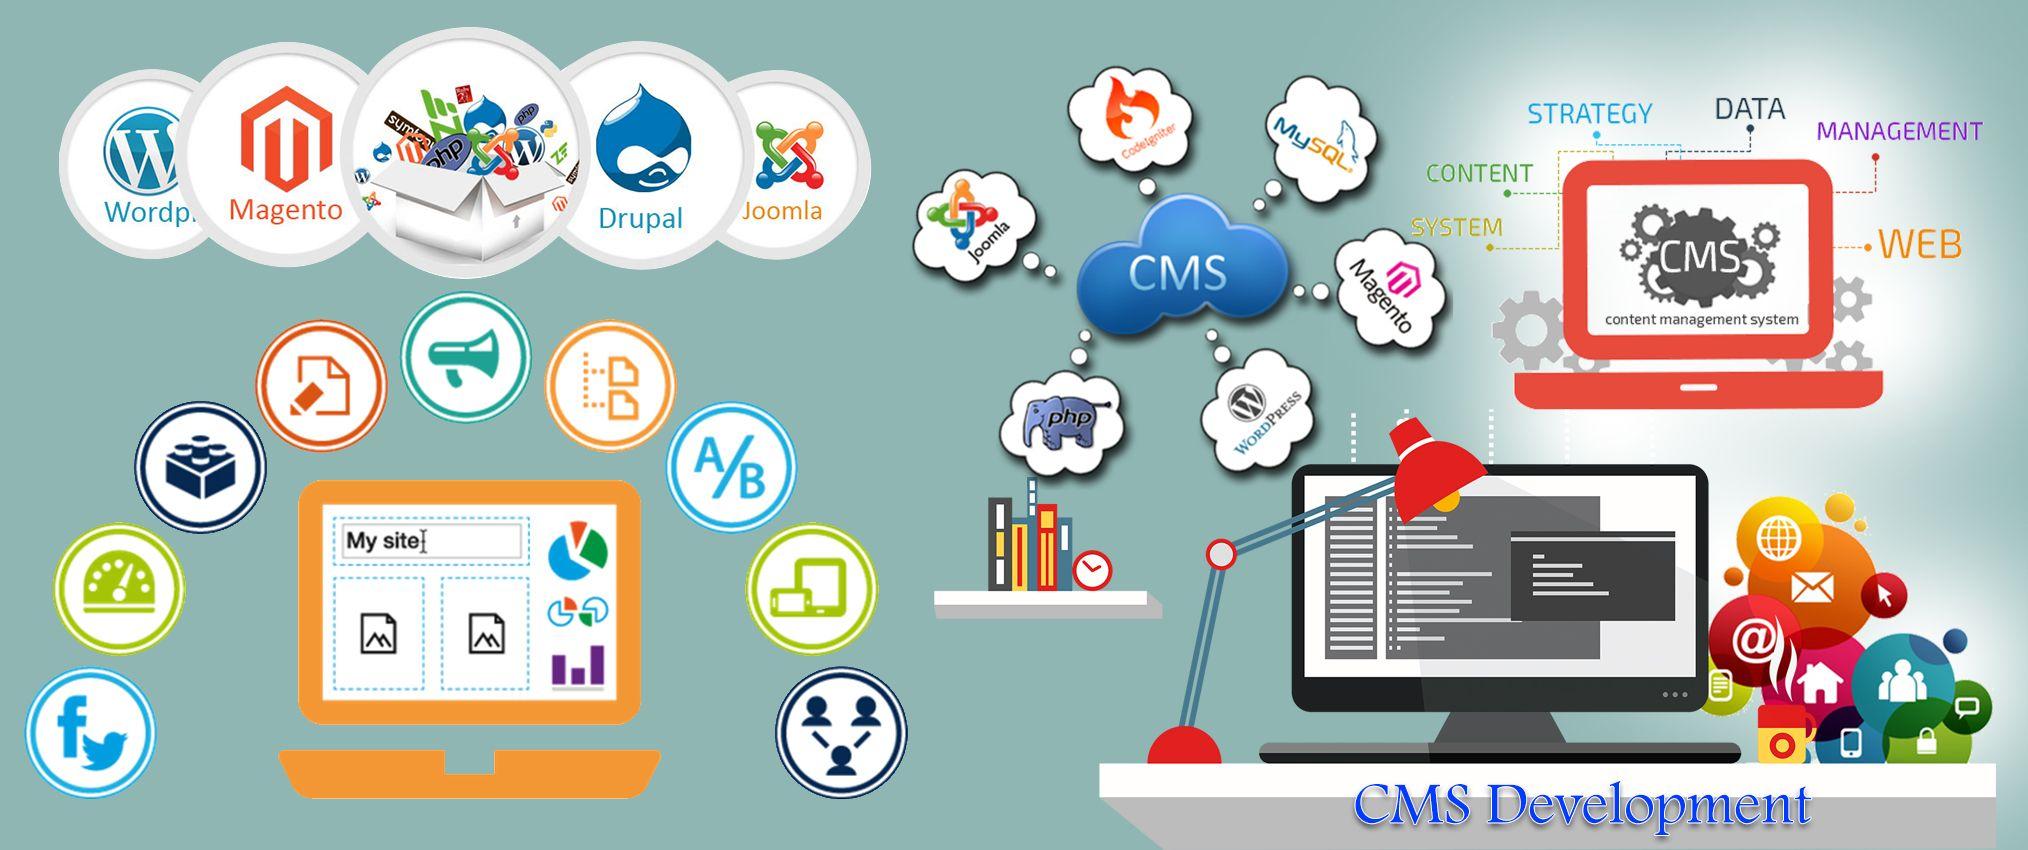 Cms Development Custom Web Design Web Design Company Web Development Design